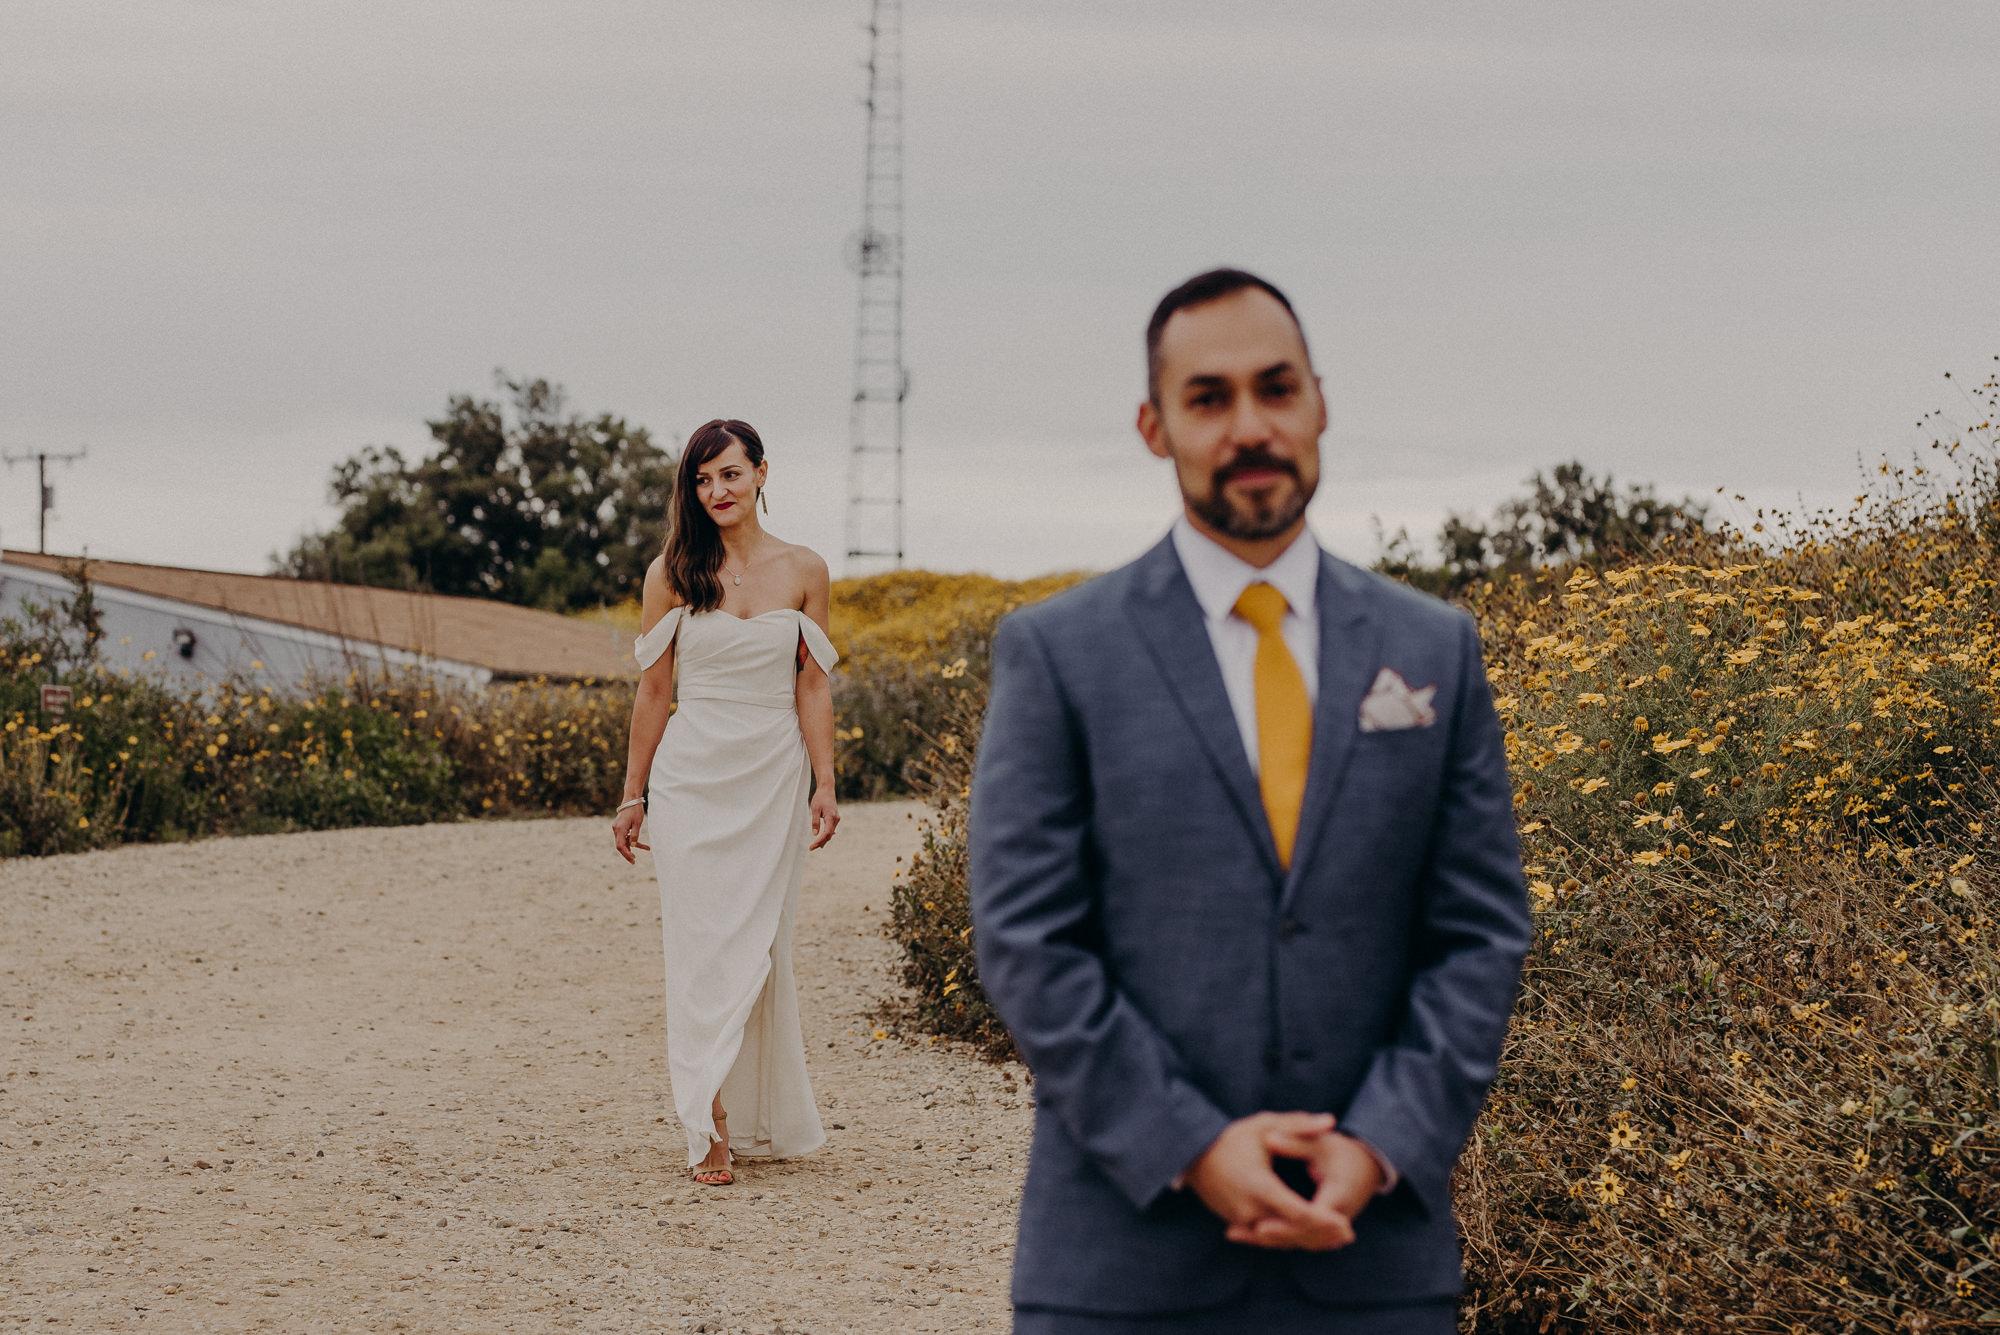 elopement photographer in los angeles - la wedding photographer - isaiahandtaylor.com-009.jpg